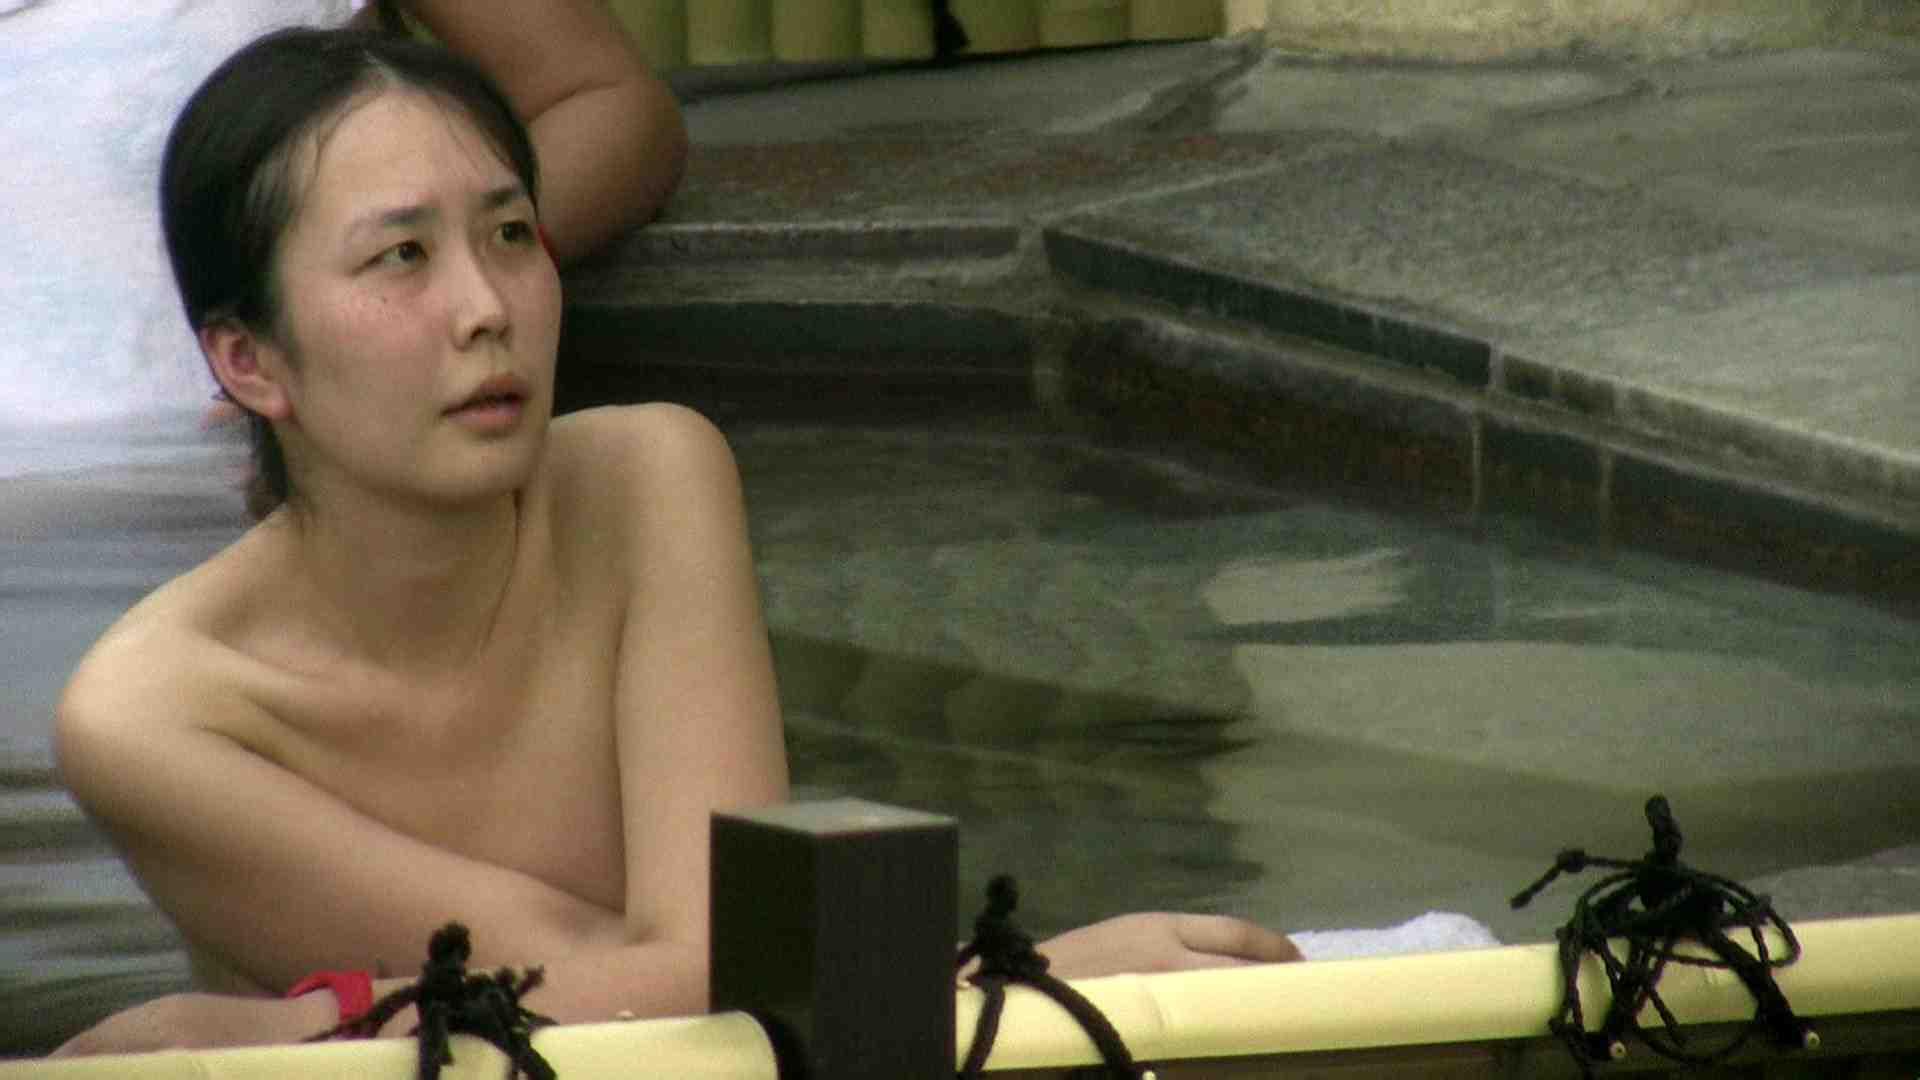 Aquaな露天風呂Vol.636 OL女体  87連発 87